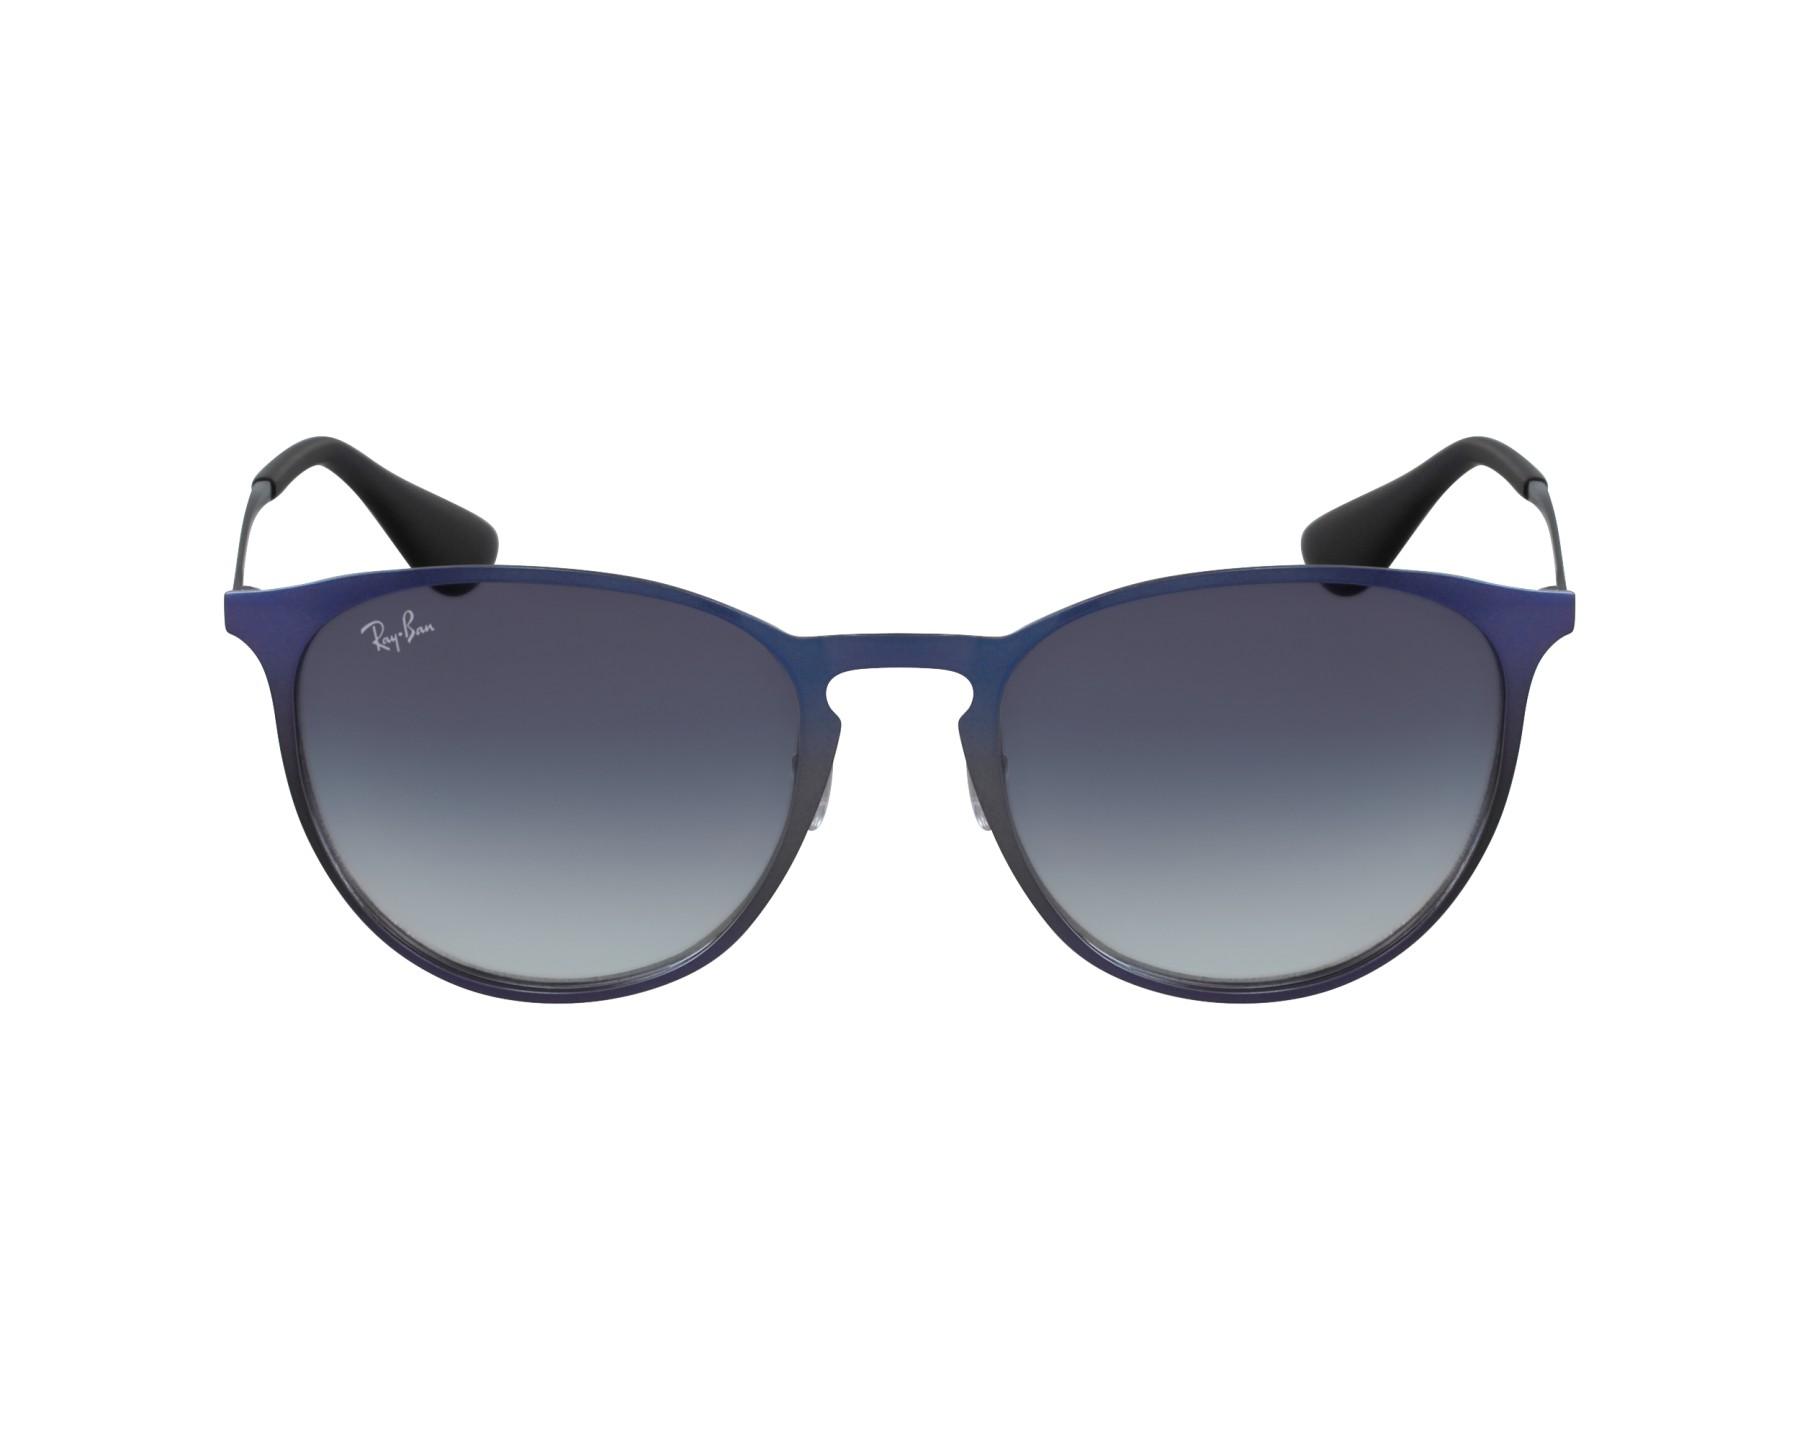 acheter des lunettes de soleil ray ban rb 3539 194 19 visionet. Black Bedroom Furniture Sets. Home Design Ideas